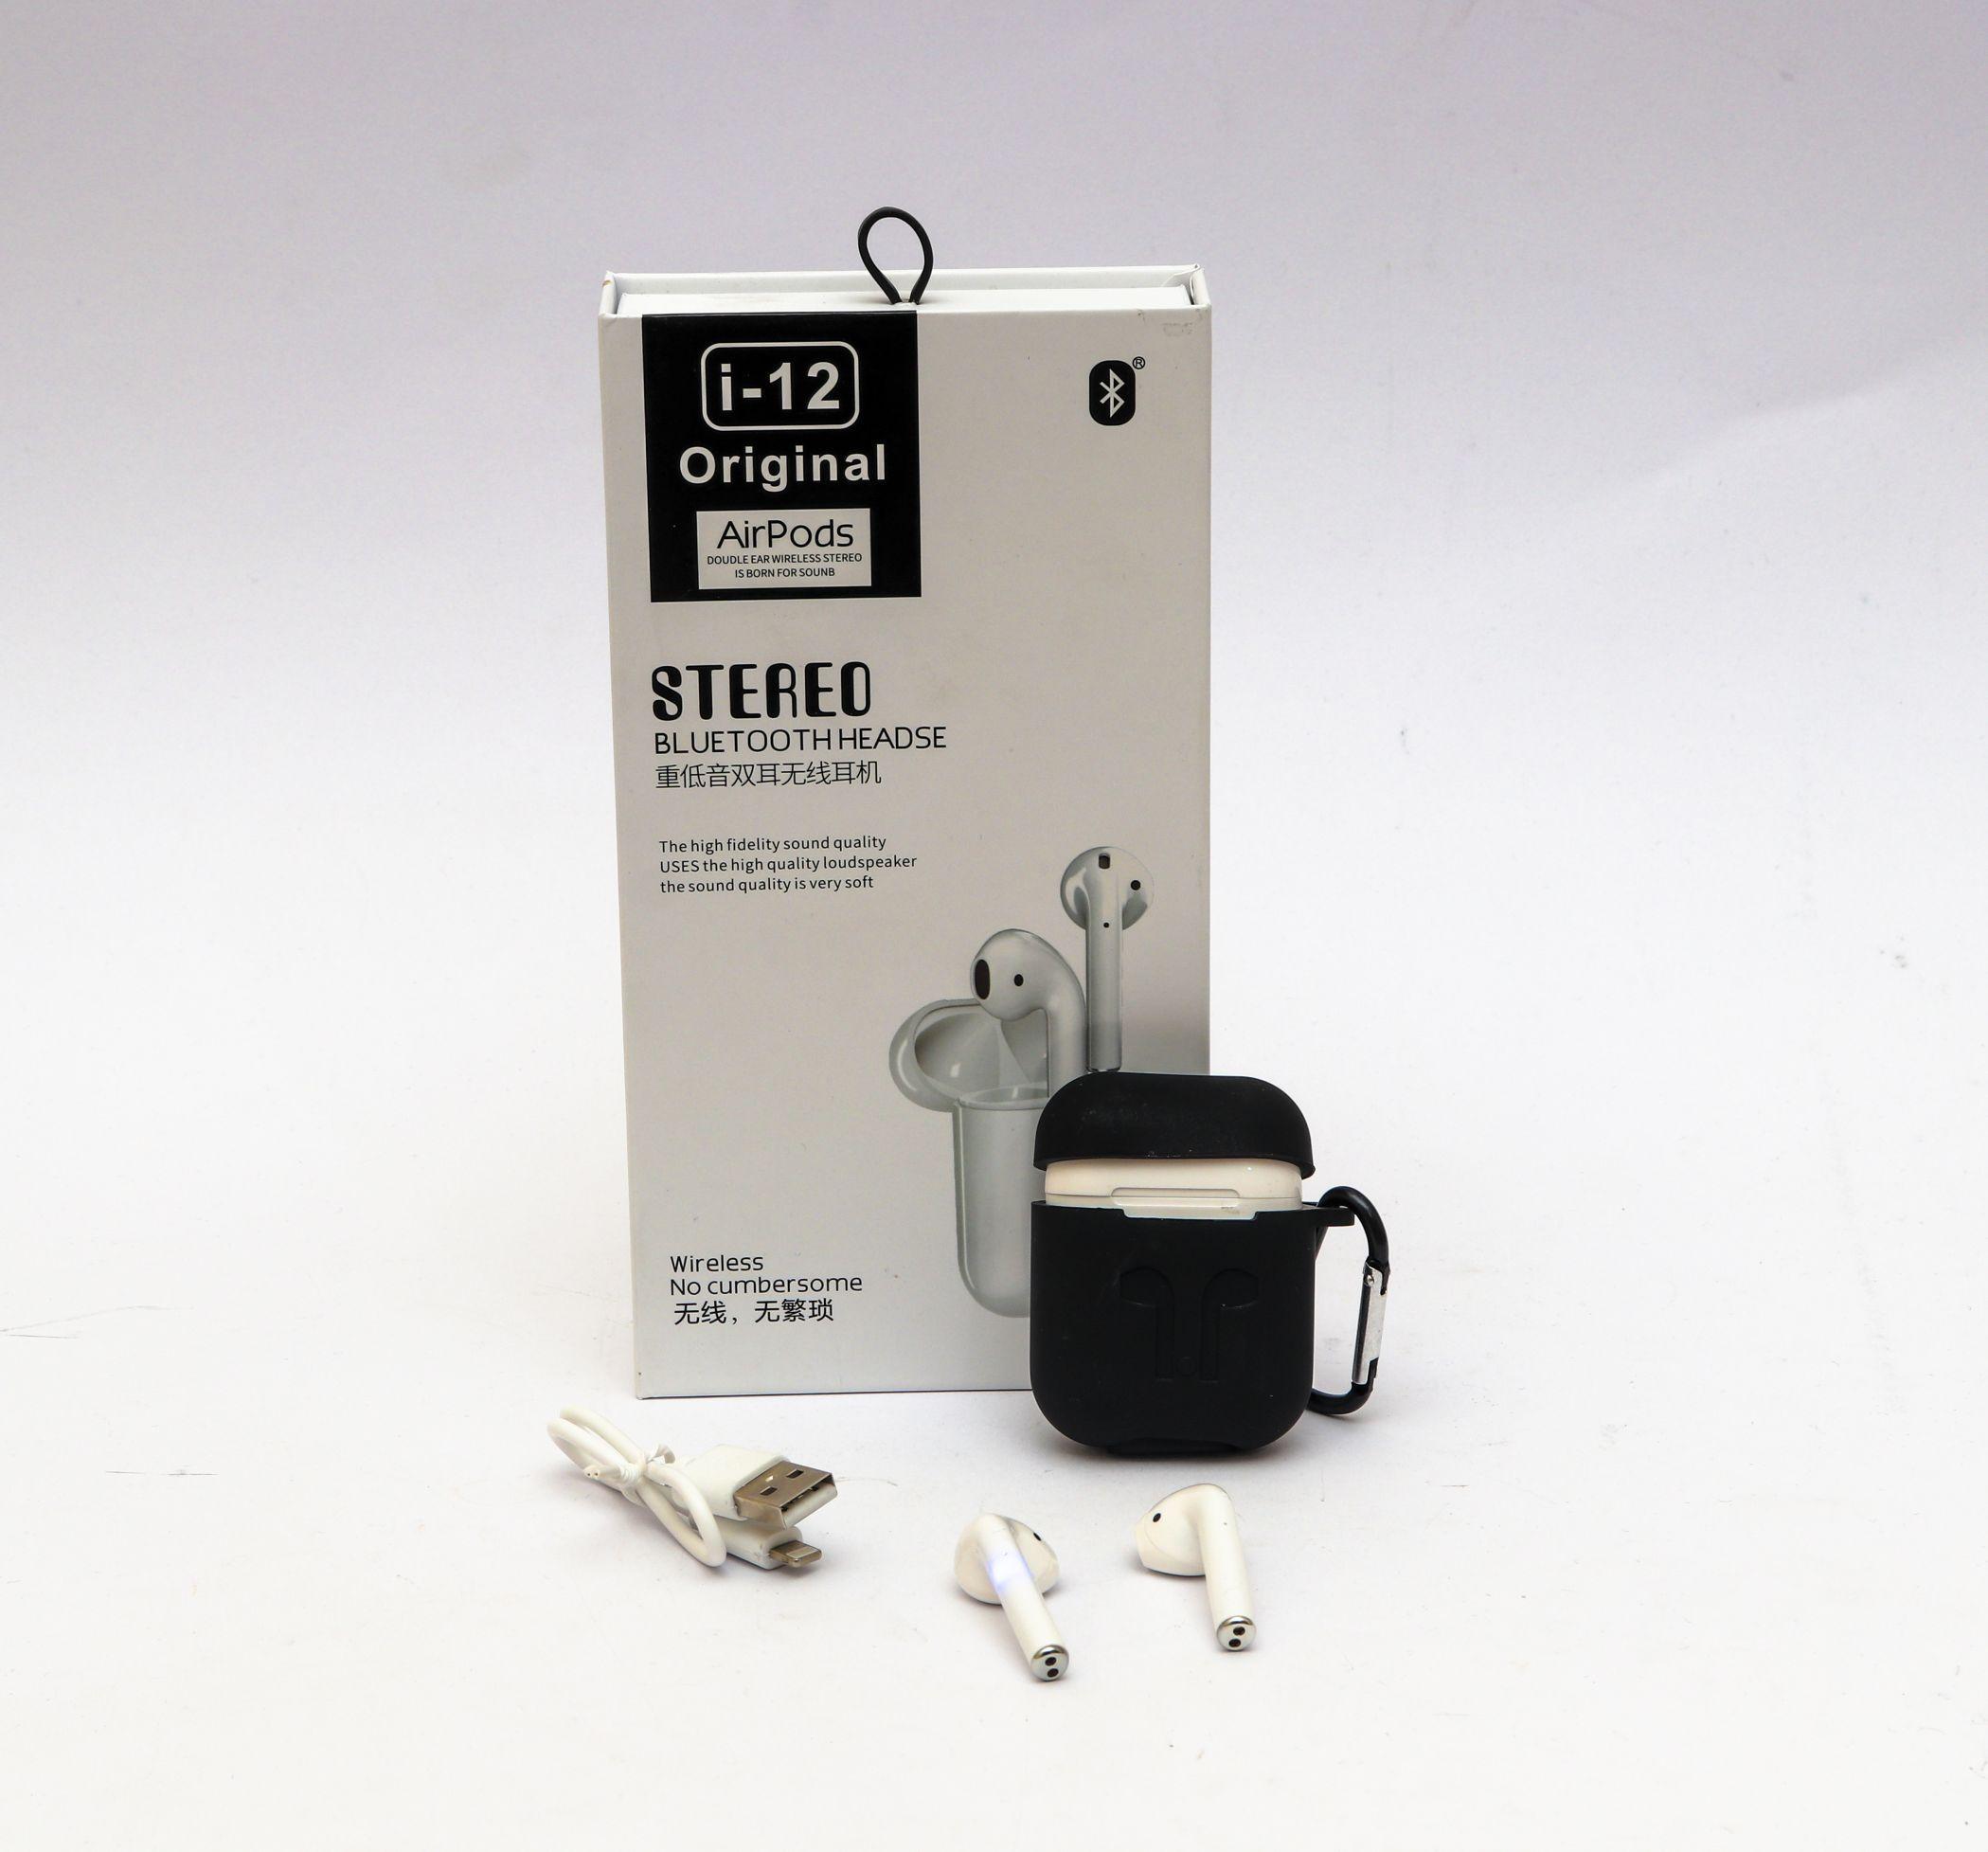 Airpods I12 Original White بسعر 370ج بدل من 450ج Phone Accessories Usb Flash Drive Flash Drive